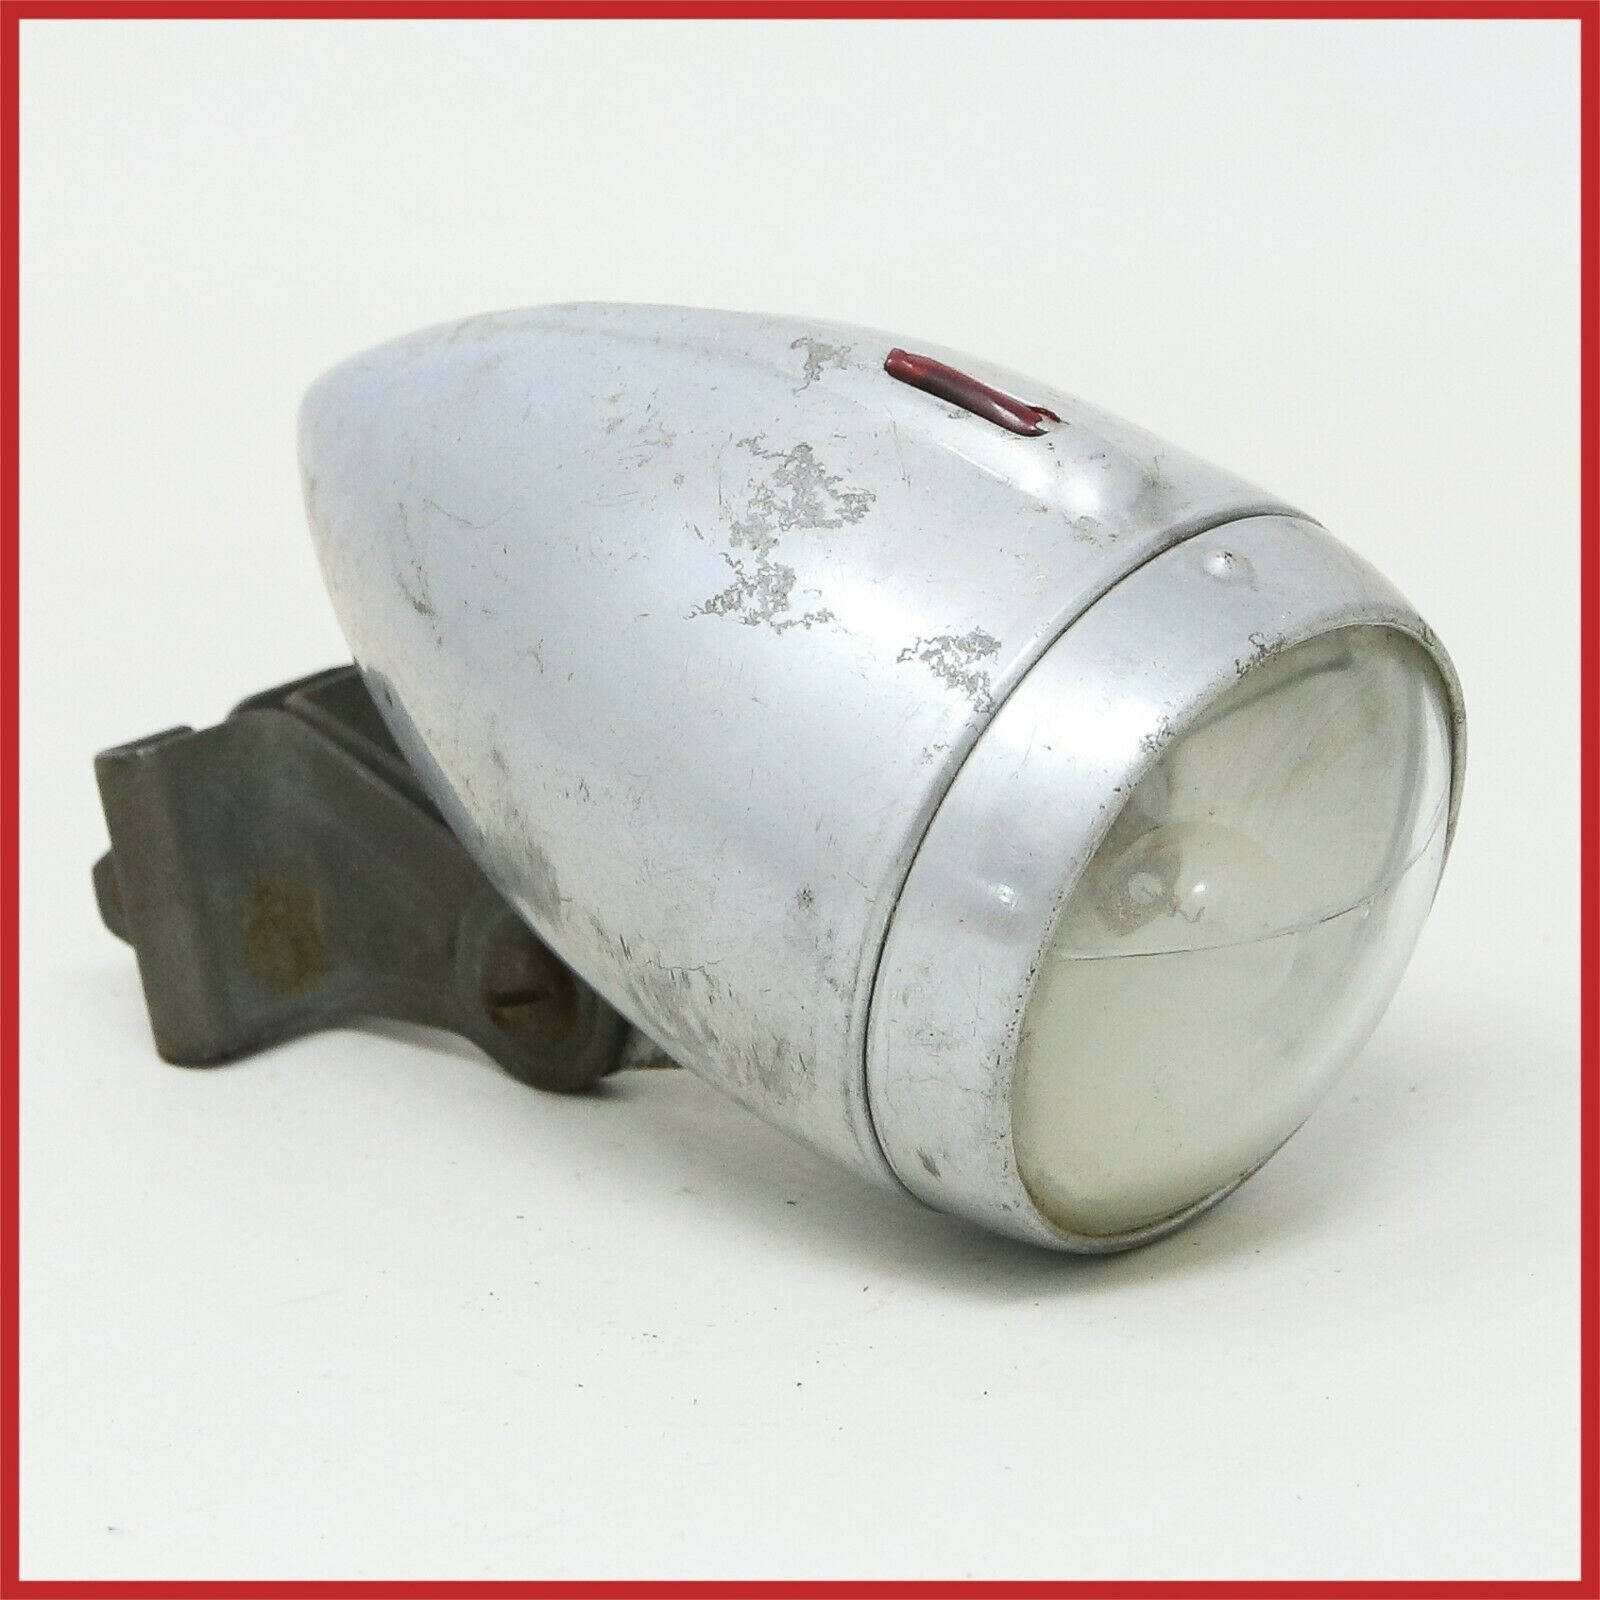 ALLOY HEADLAMP 30s 40s ROAD TOURING BIKE ANTIQUE VINTAGE LAMP LIGHT ALUMINIUM 50